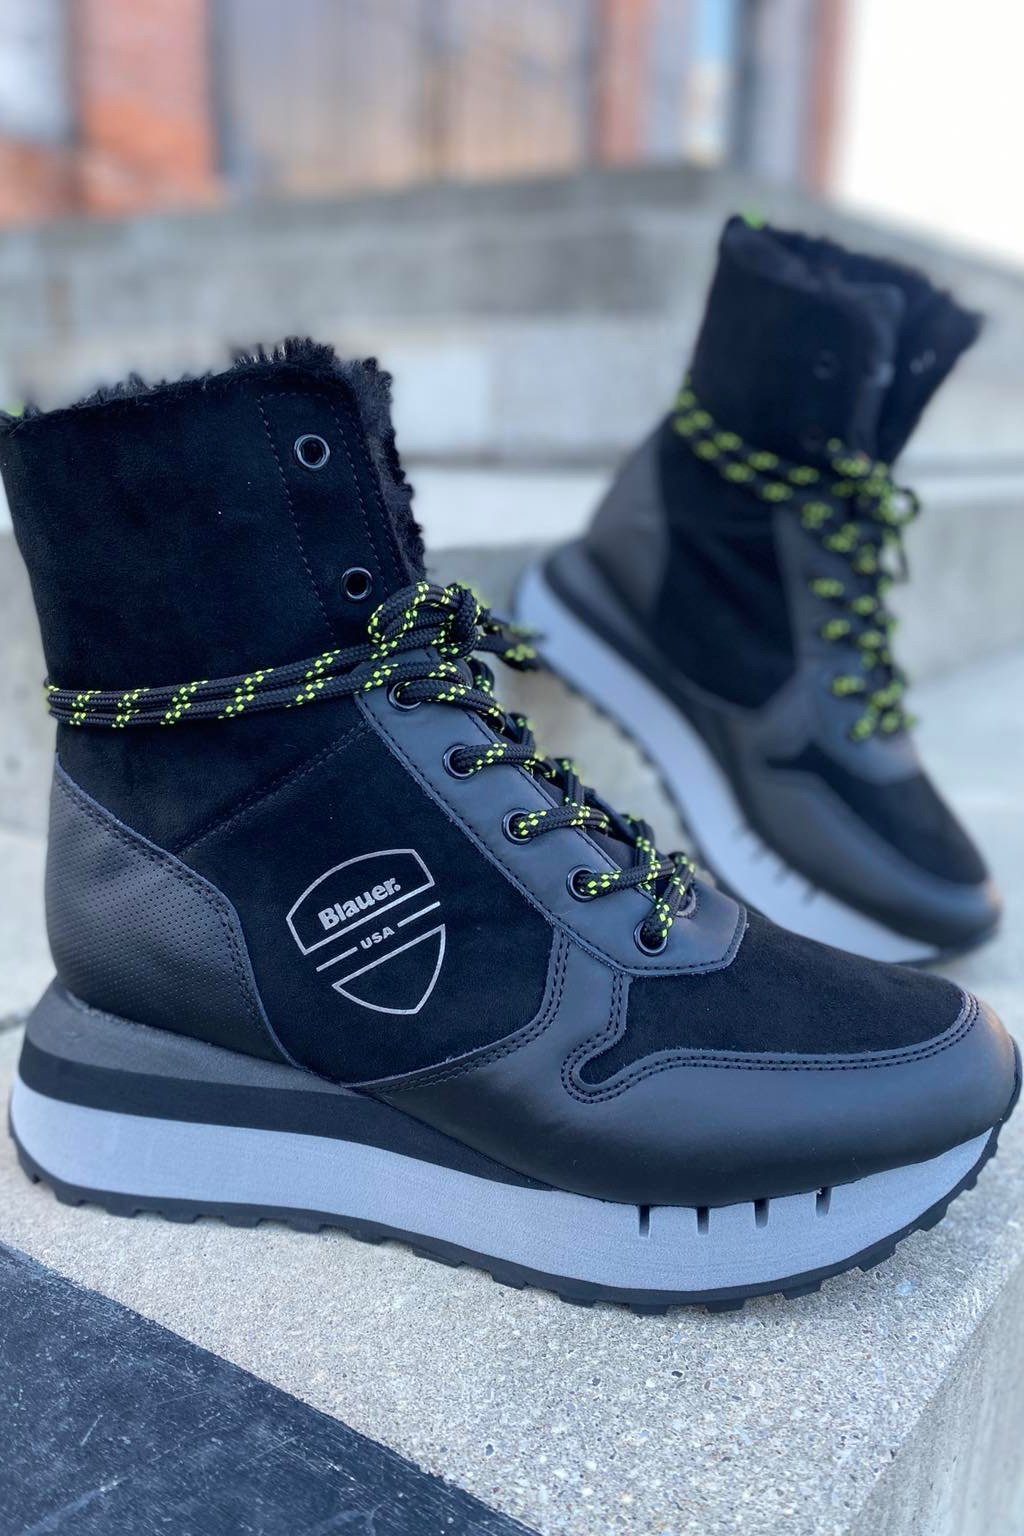 Dámská obuv Blauer F1CHARLEY03 SHE černá